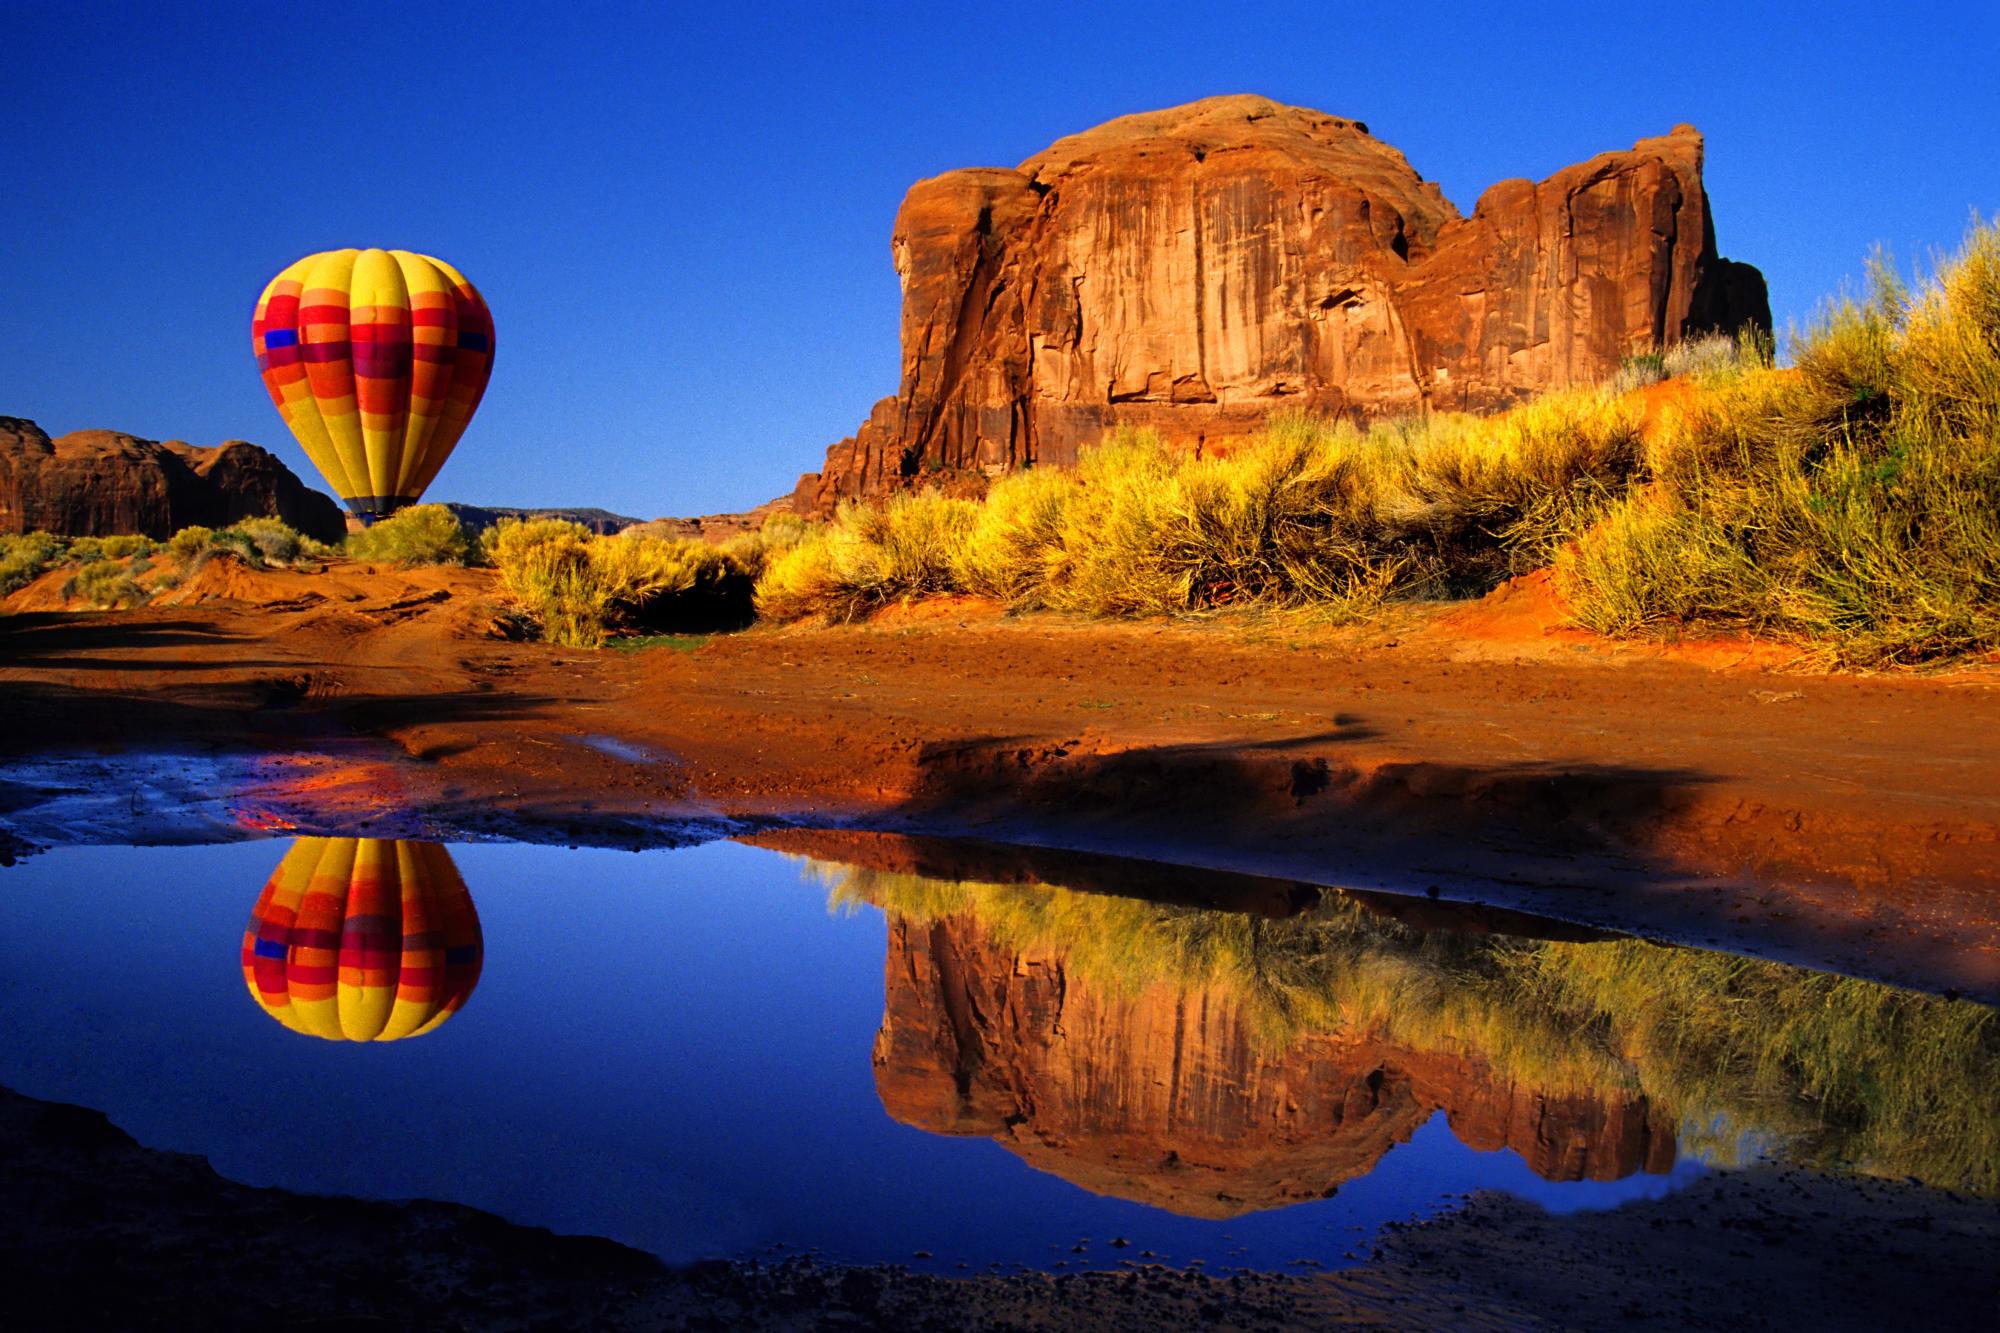 nature-arizona-desert-hd-wallpapers-hd-1333×2000-hd-